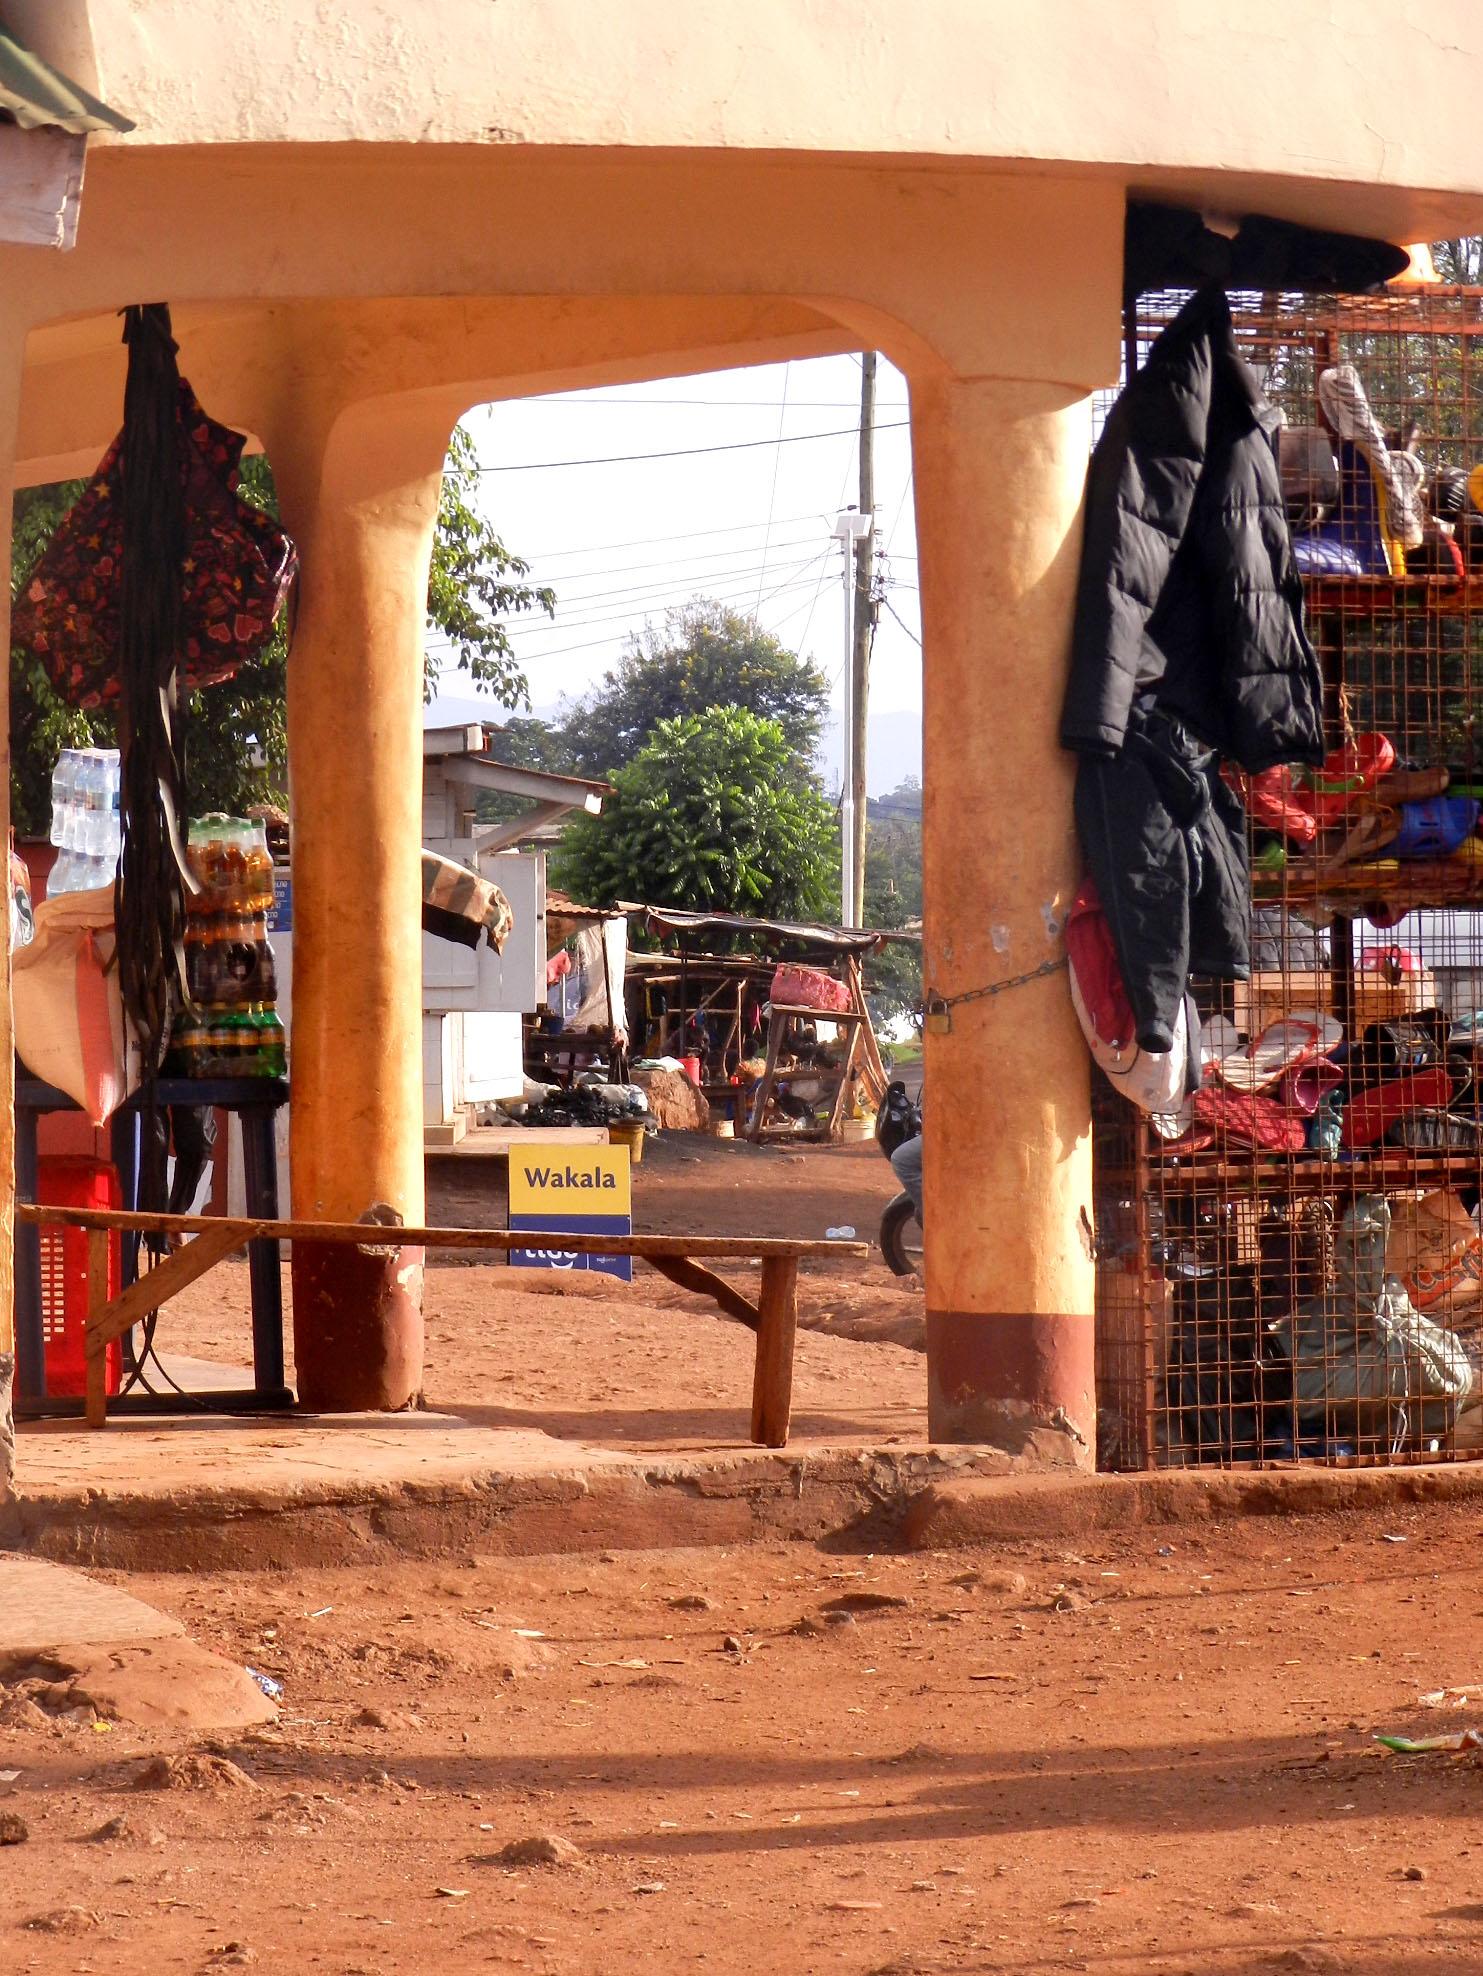 moshi_market_scene.jpg